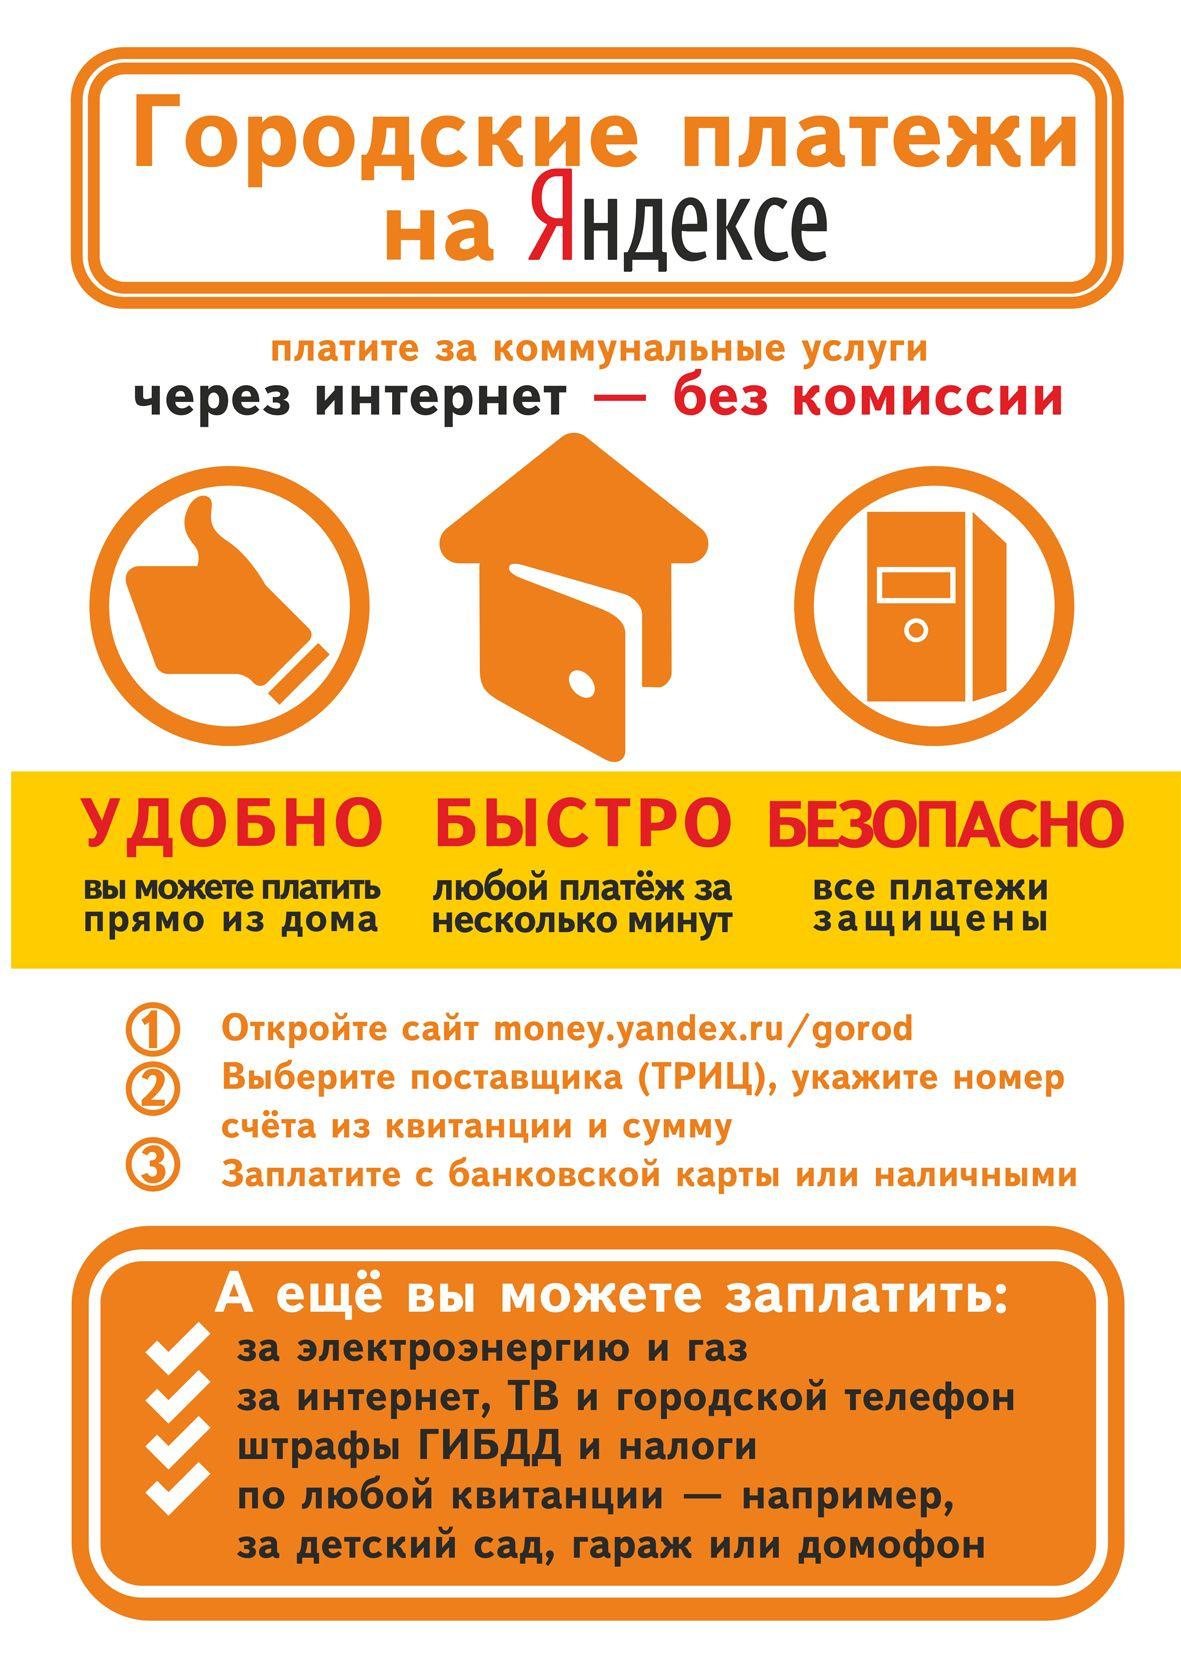 Реклама Яндекс.Денег для оплаты ЖКХ - дизайнер art-valeri